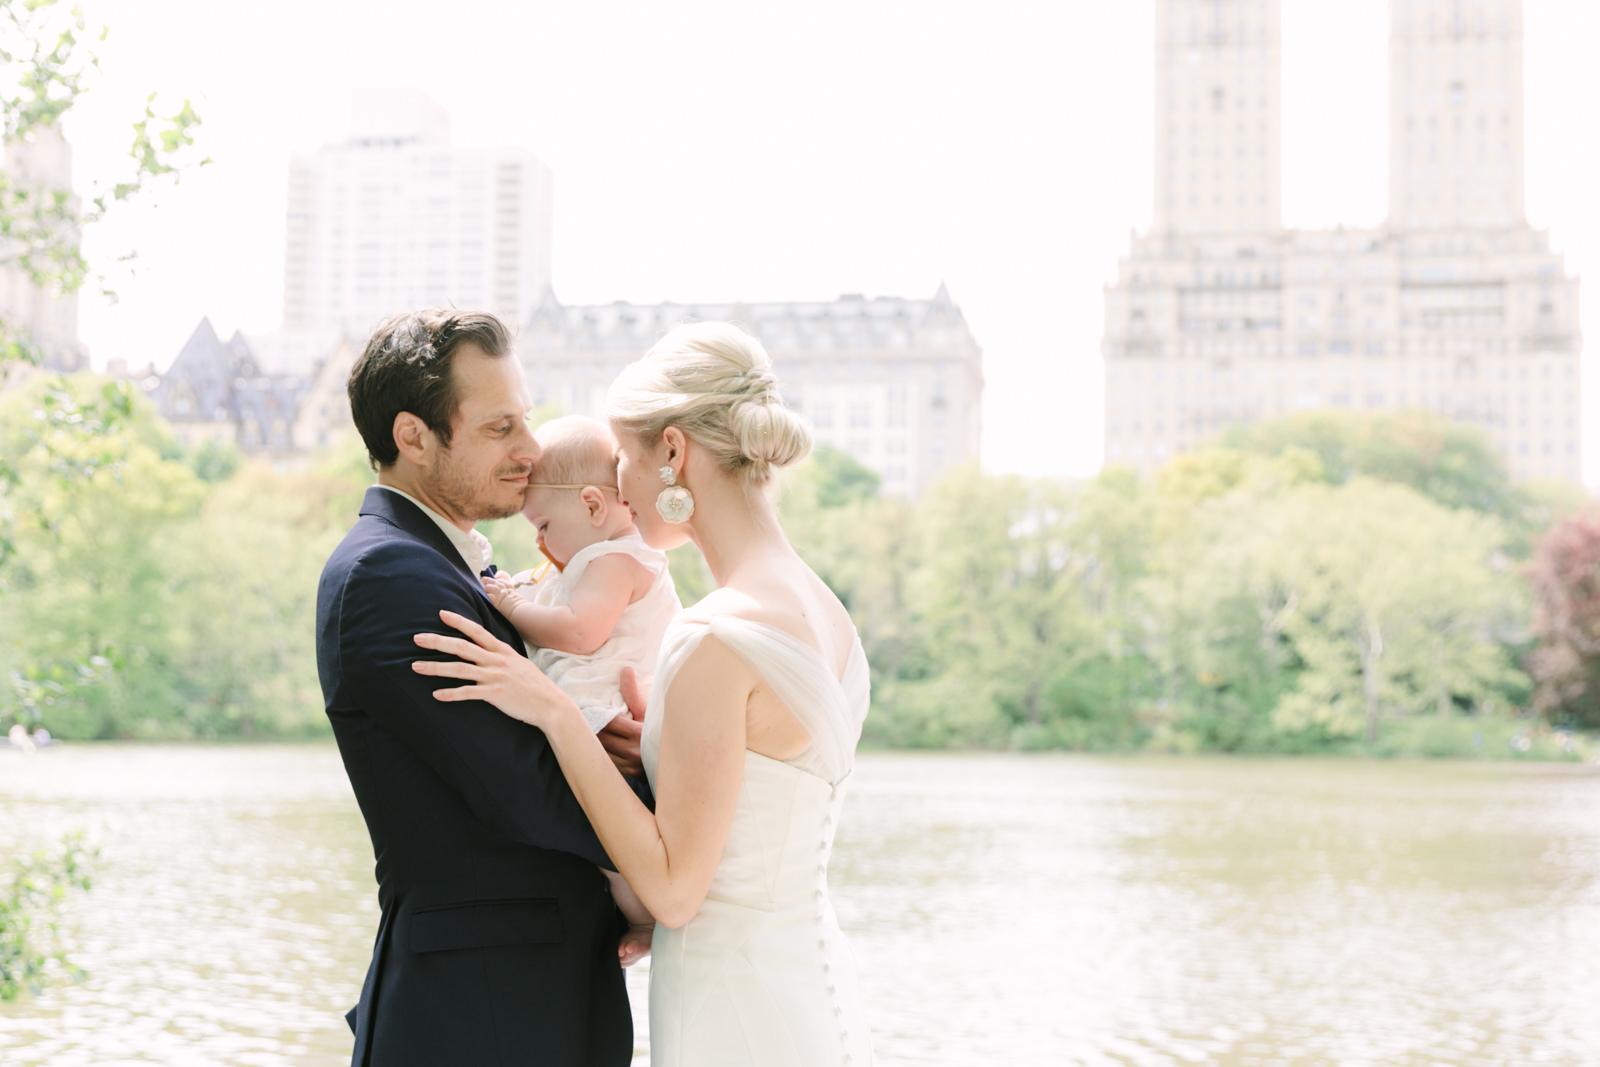 Intimate-NYC_wedding_ by Tanya Isaeva-102.jpg